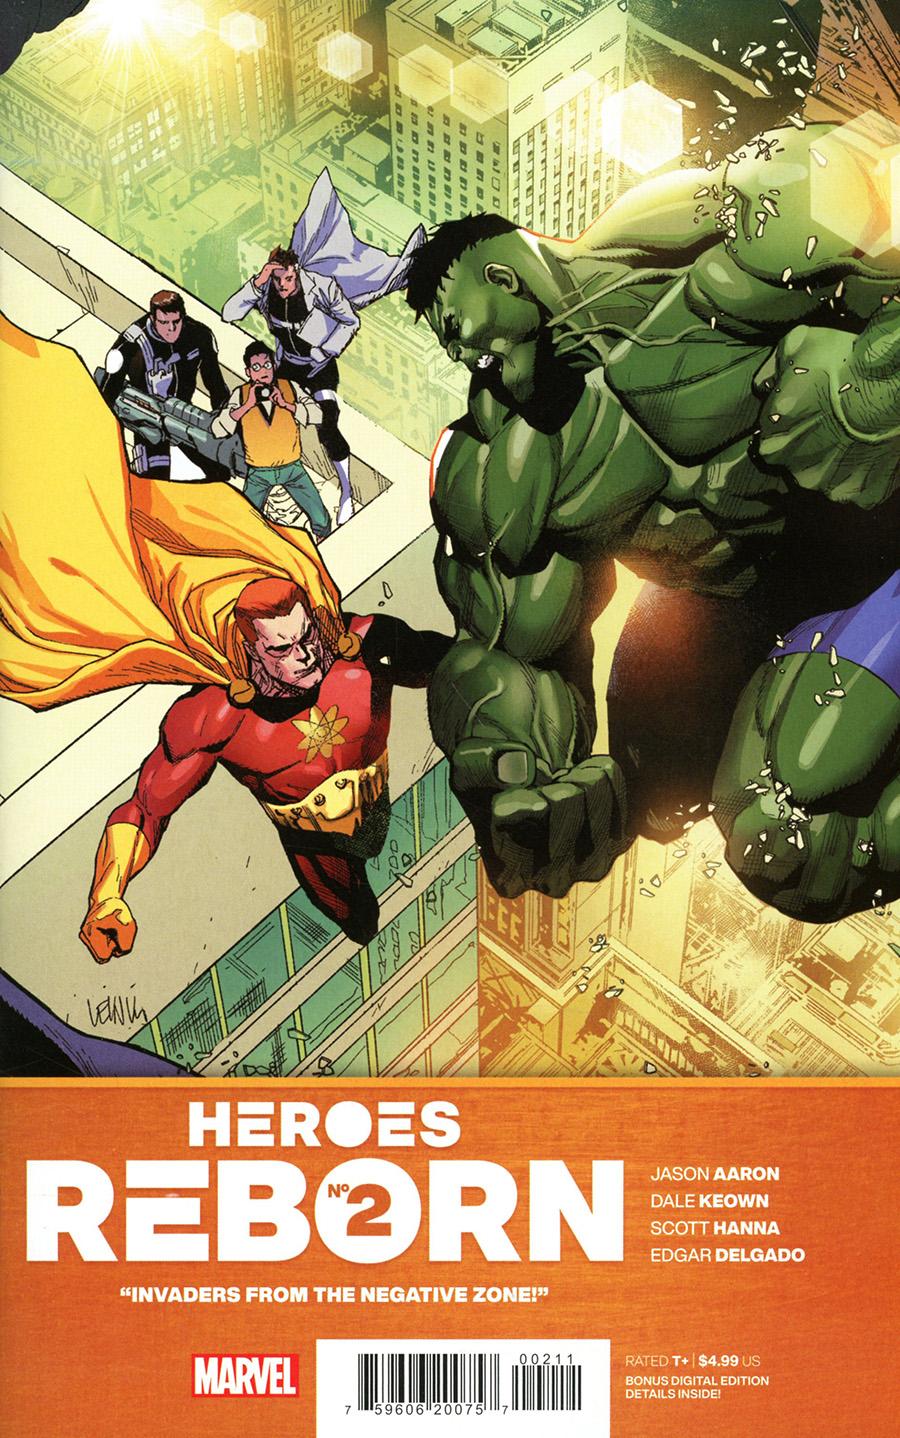 Heroes Reborn #2 Cover A Regular Leinil Francis Yu Cover